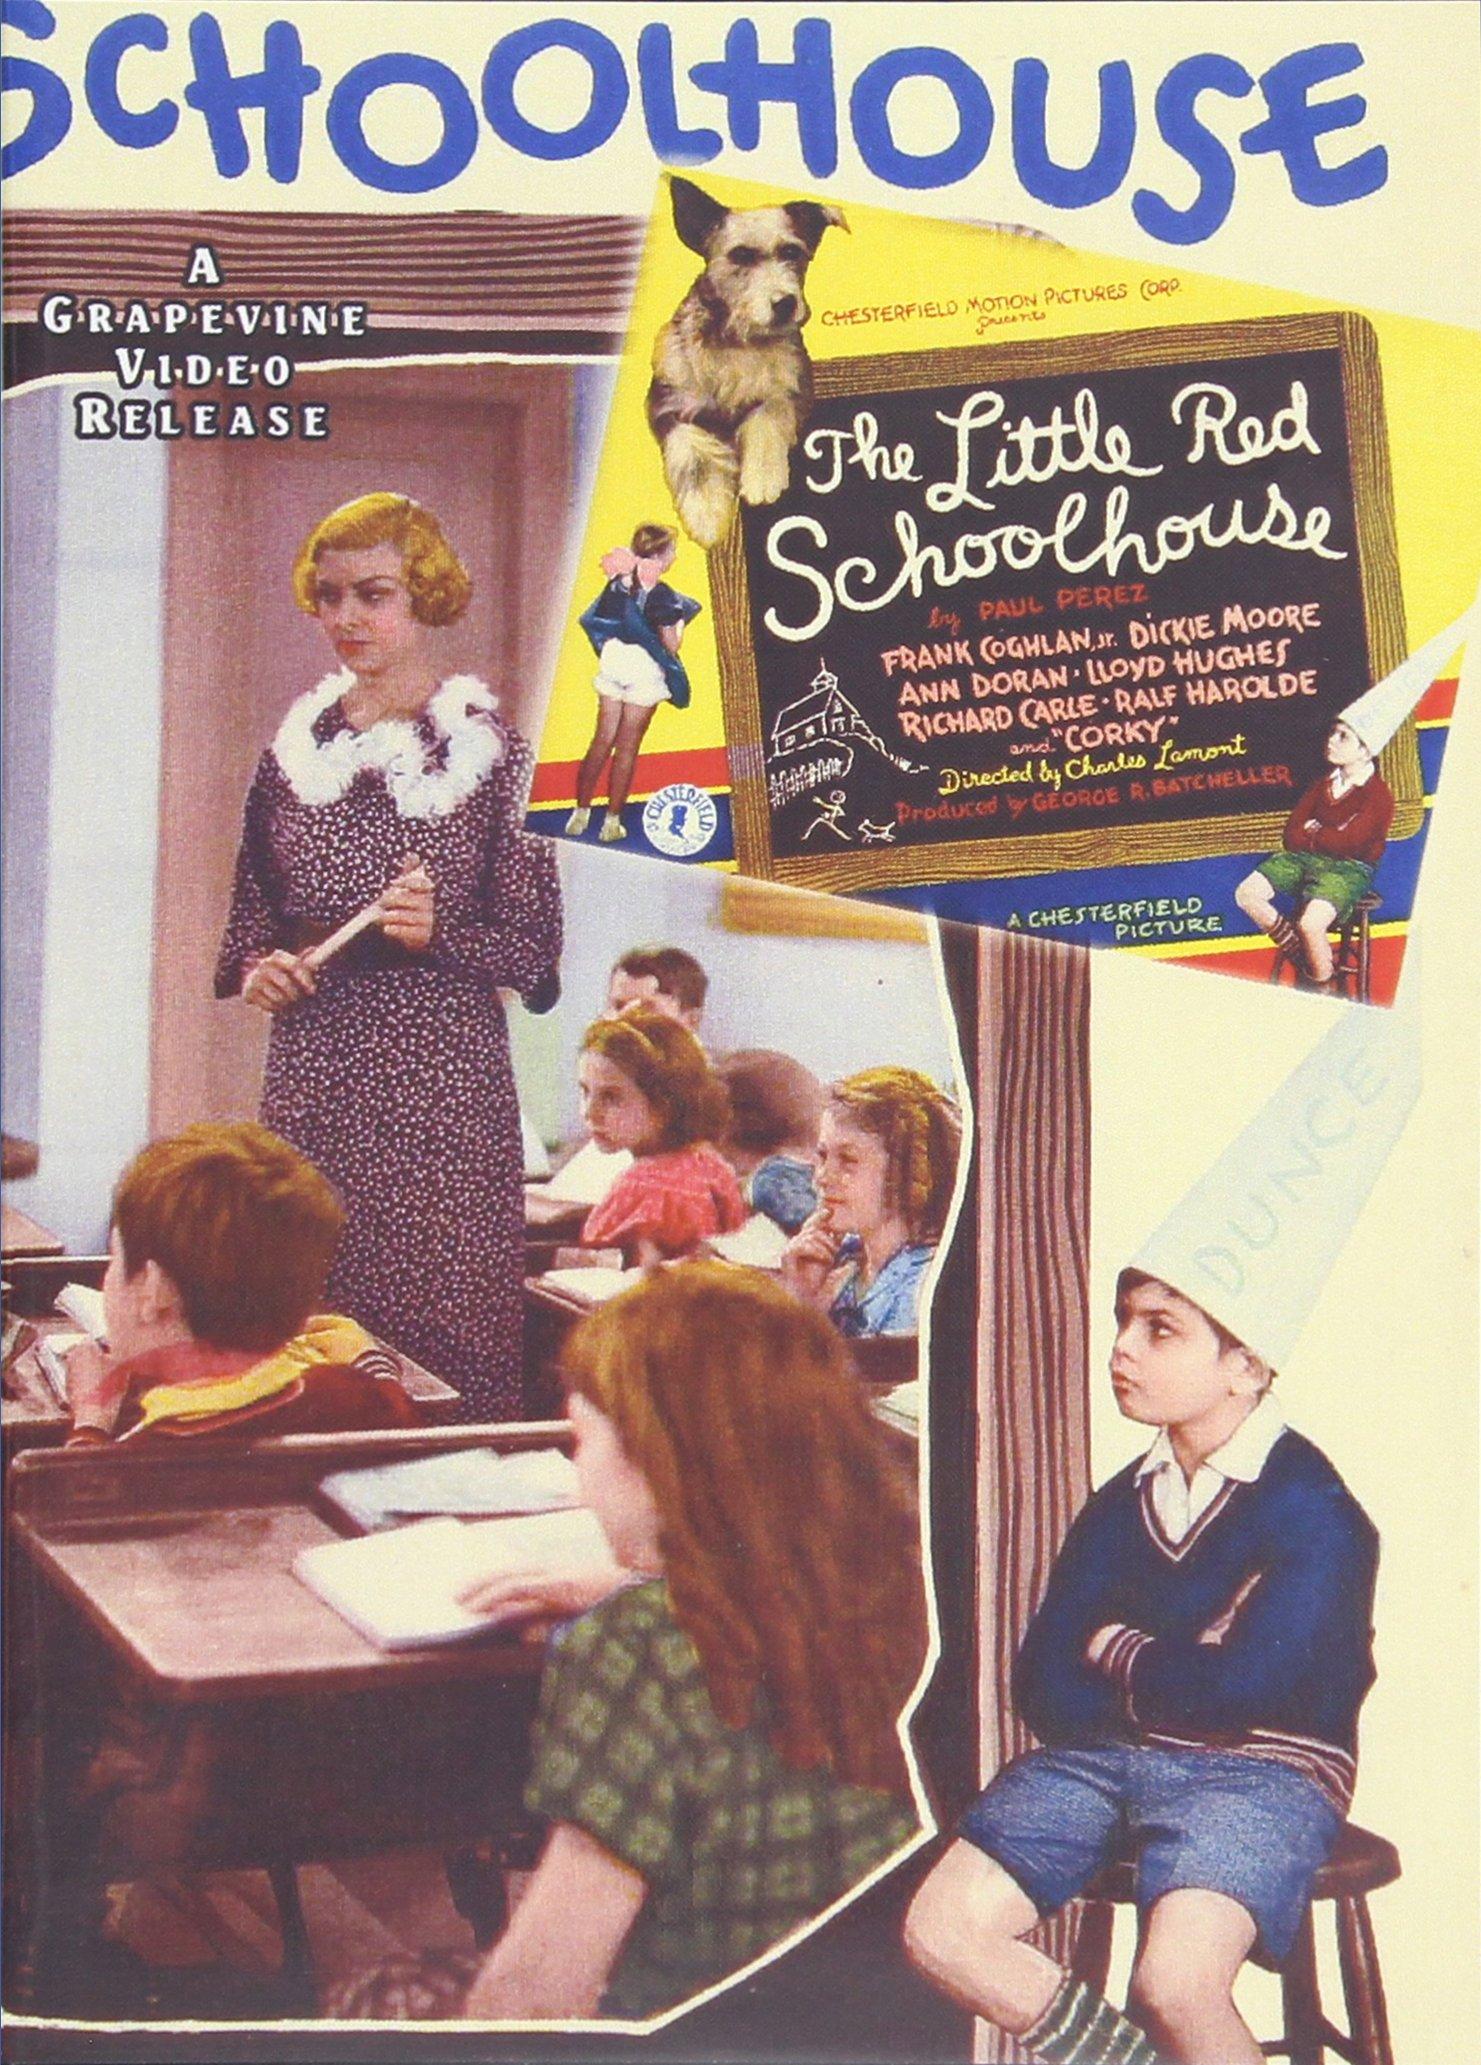 DVD : Little Red Schoolhouse 1936 (DVD)